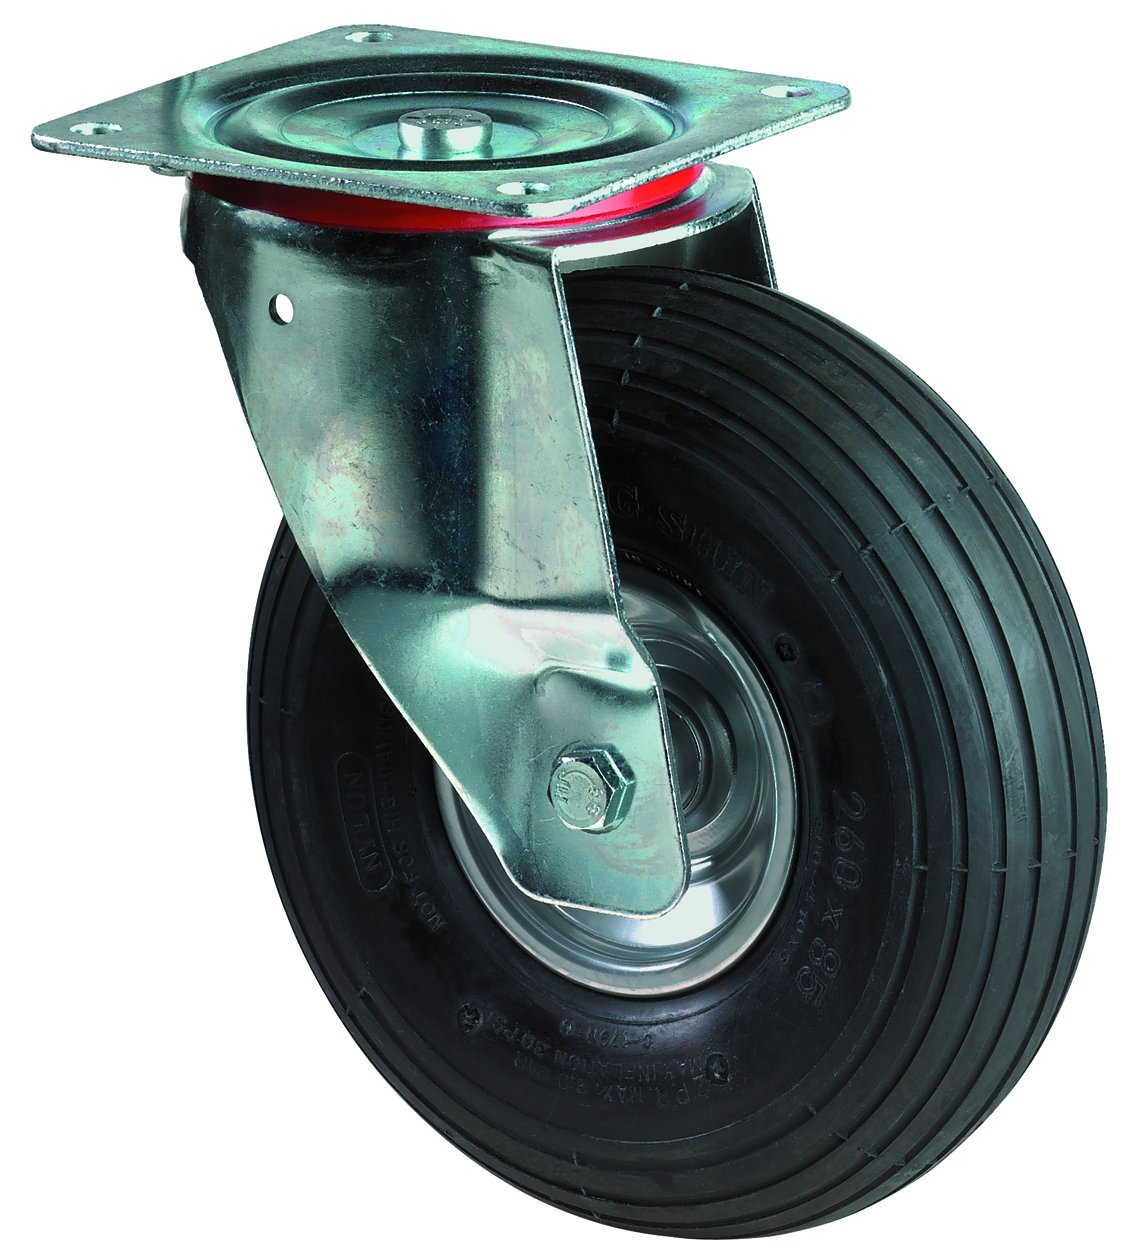 BS Rollen L400.C90.260 Transportrolle, Lenkrolle, Ø 260 mm, Anschraubplatte, Luftrad, Radkörper Stahl